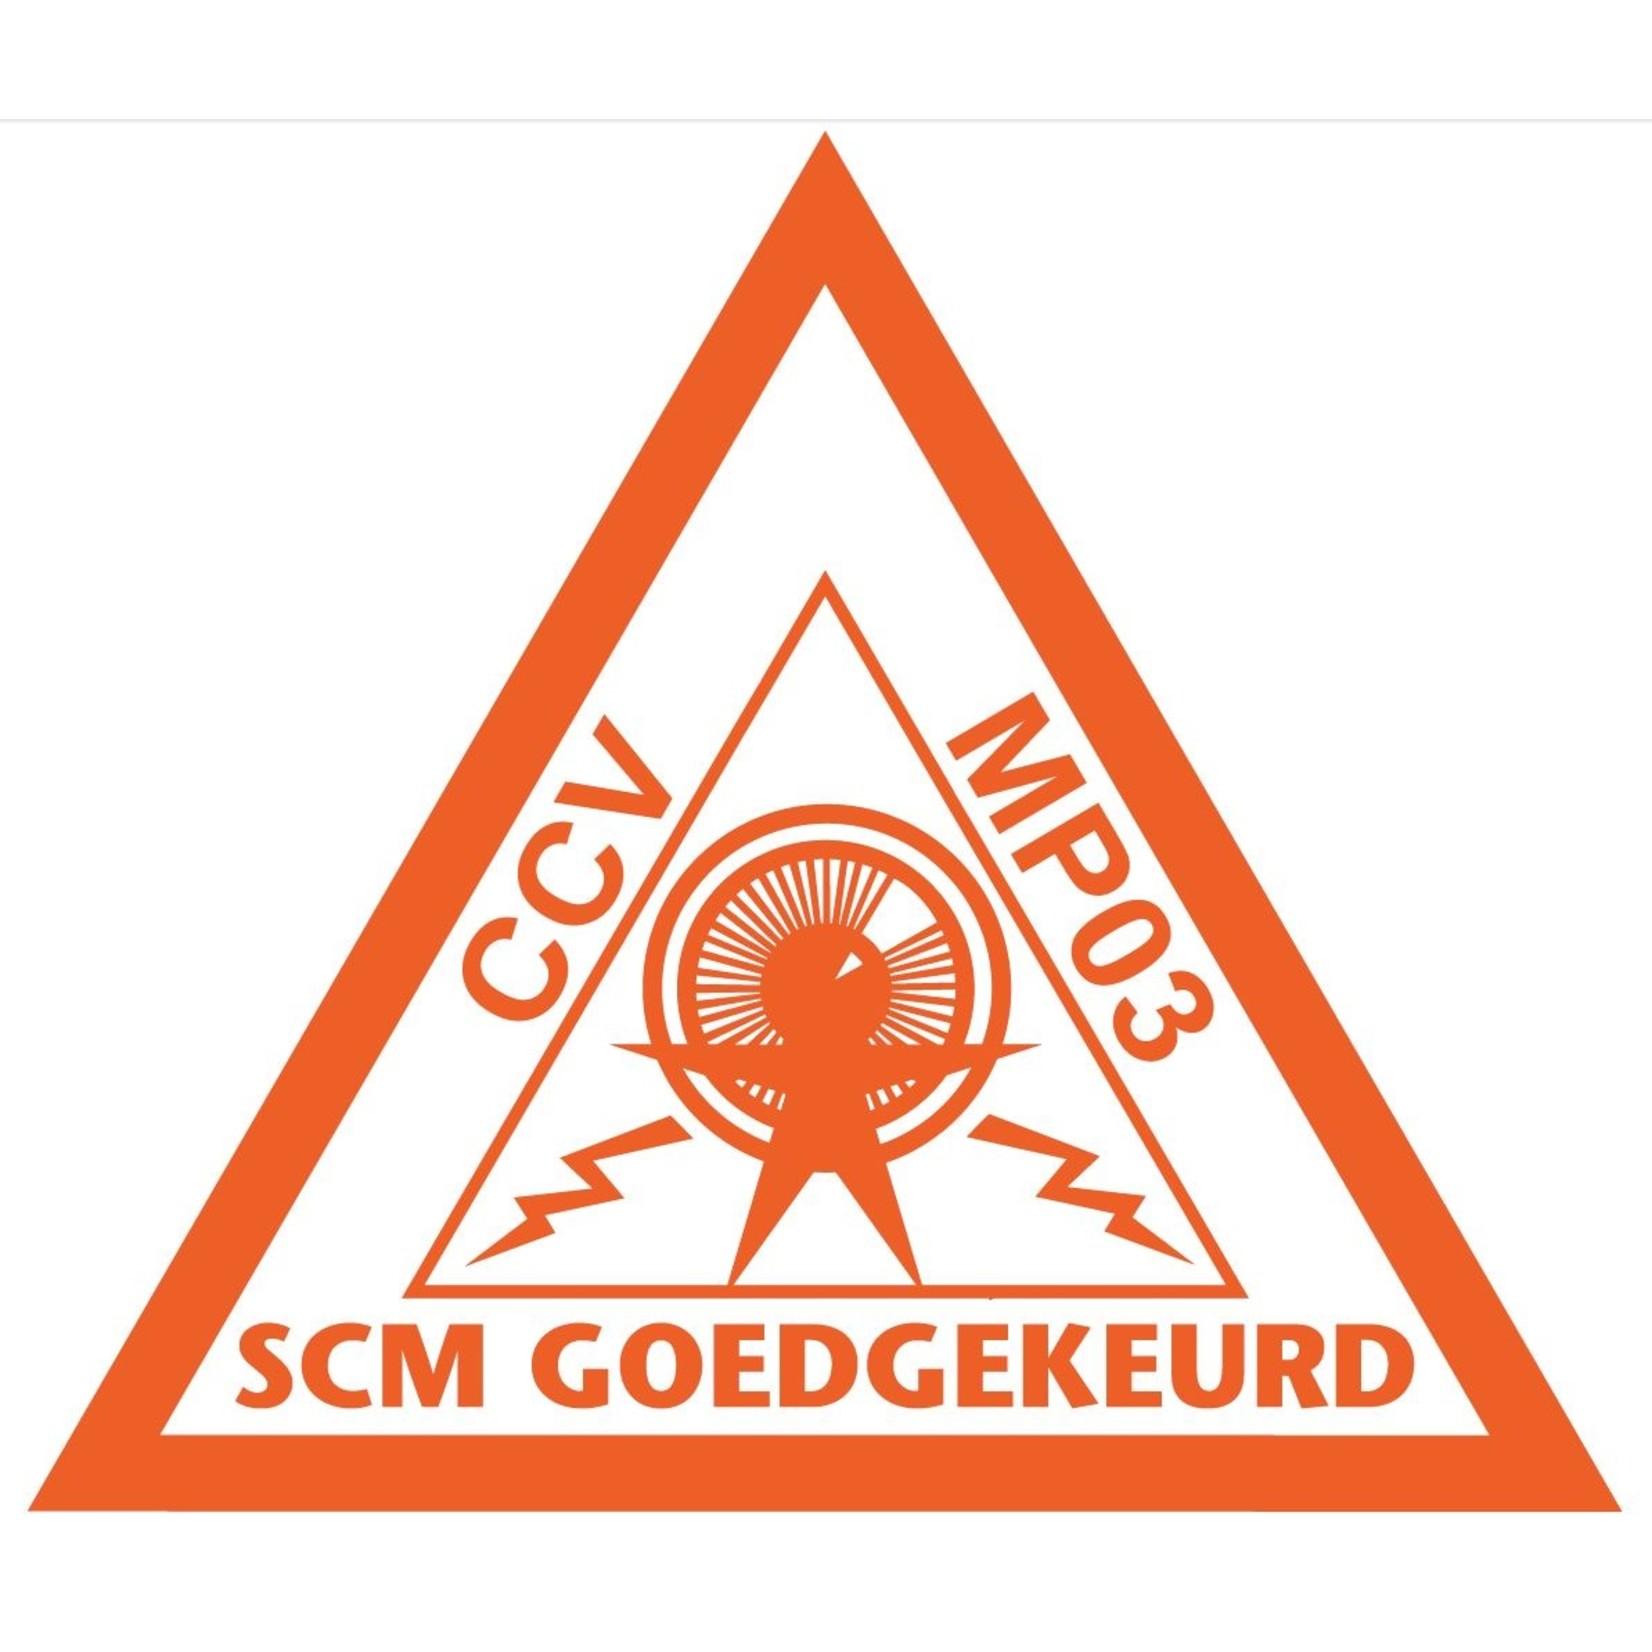 Steady Steady BBMS2 - buitenboordmotorslot - SCM goedgekeurd